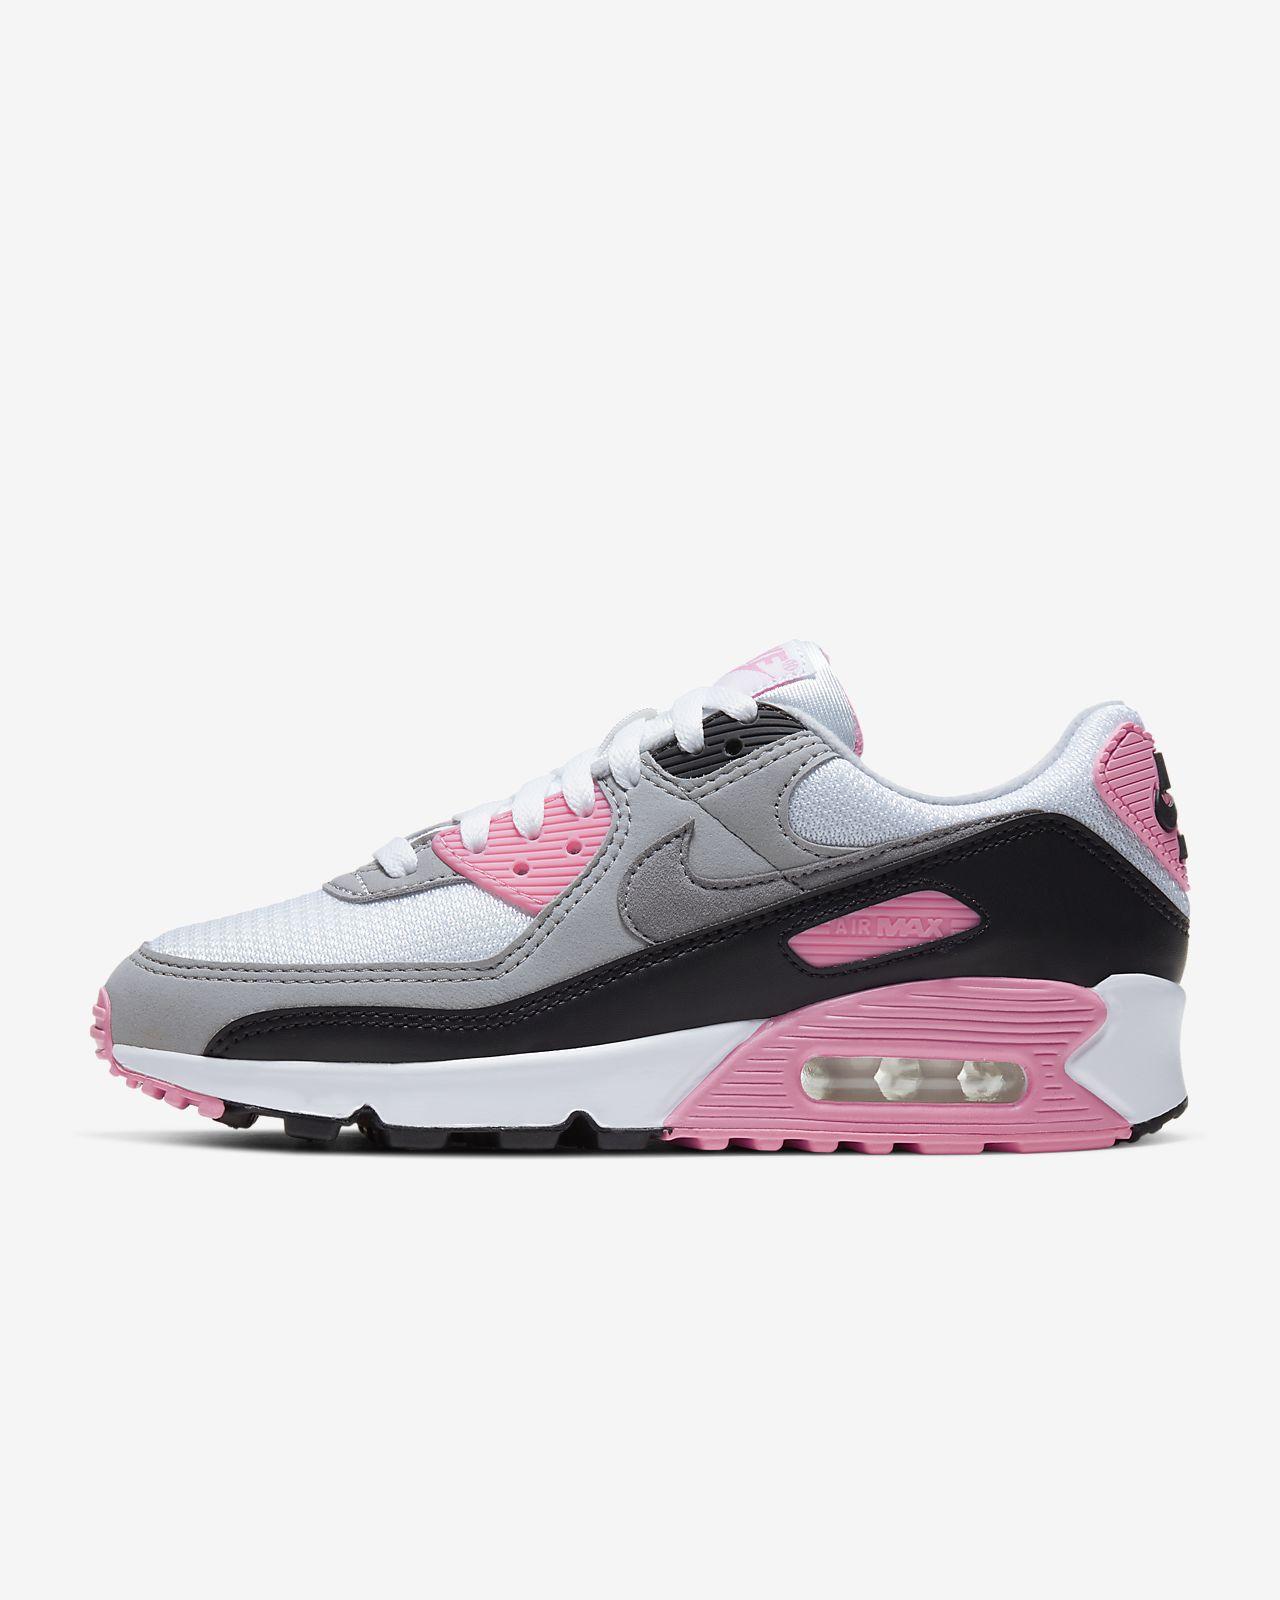 nike air max 90 womens pink